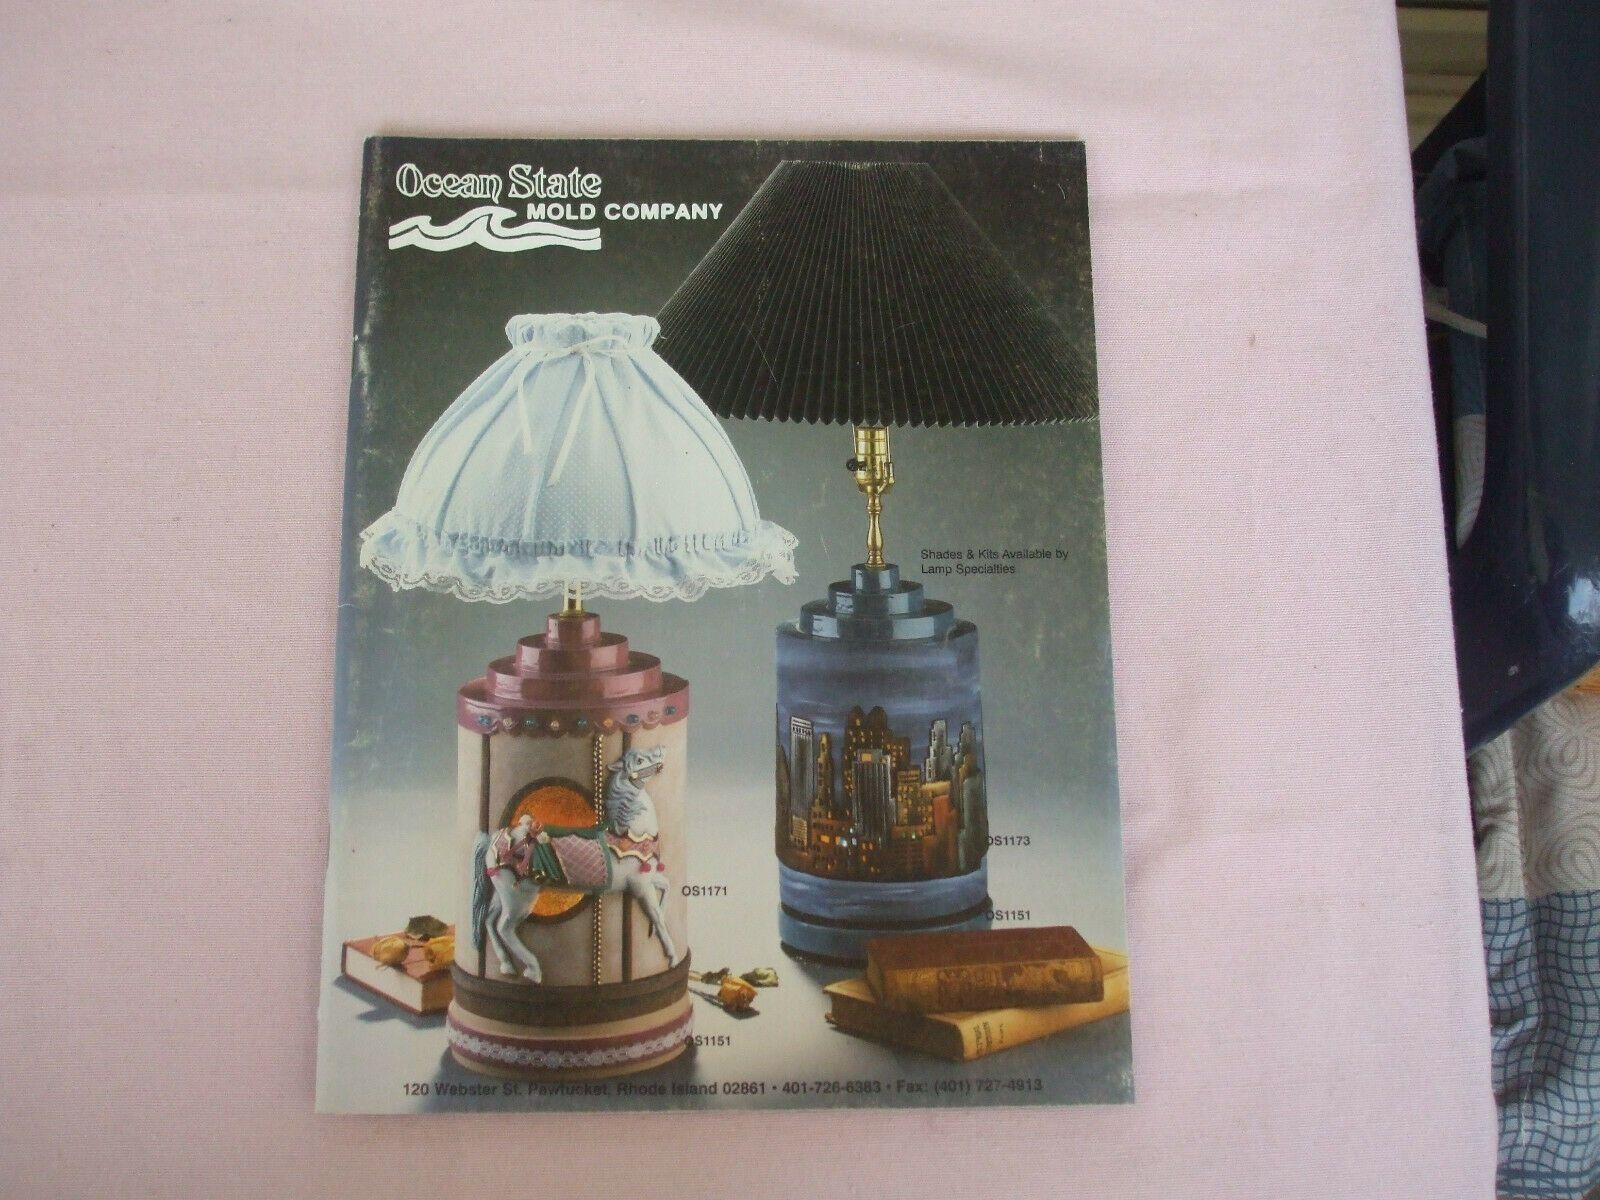 keramik katalog ocean state mold company 3rd edition